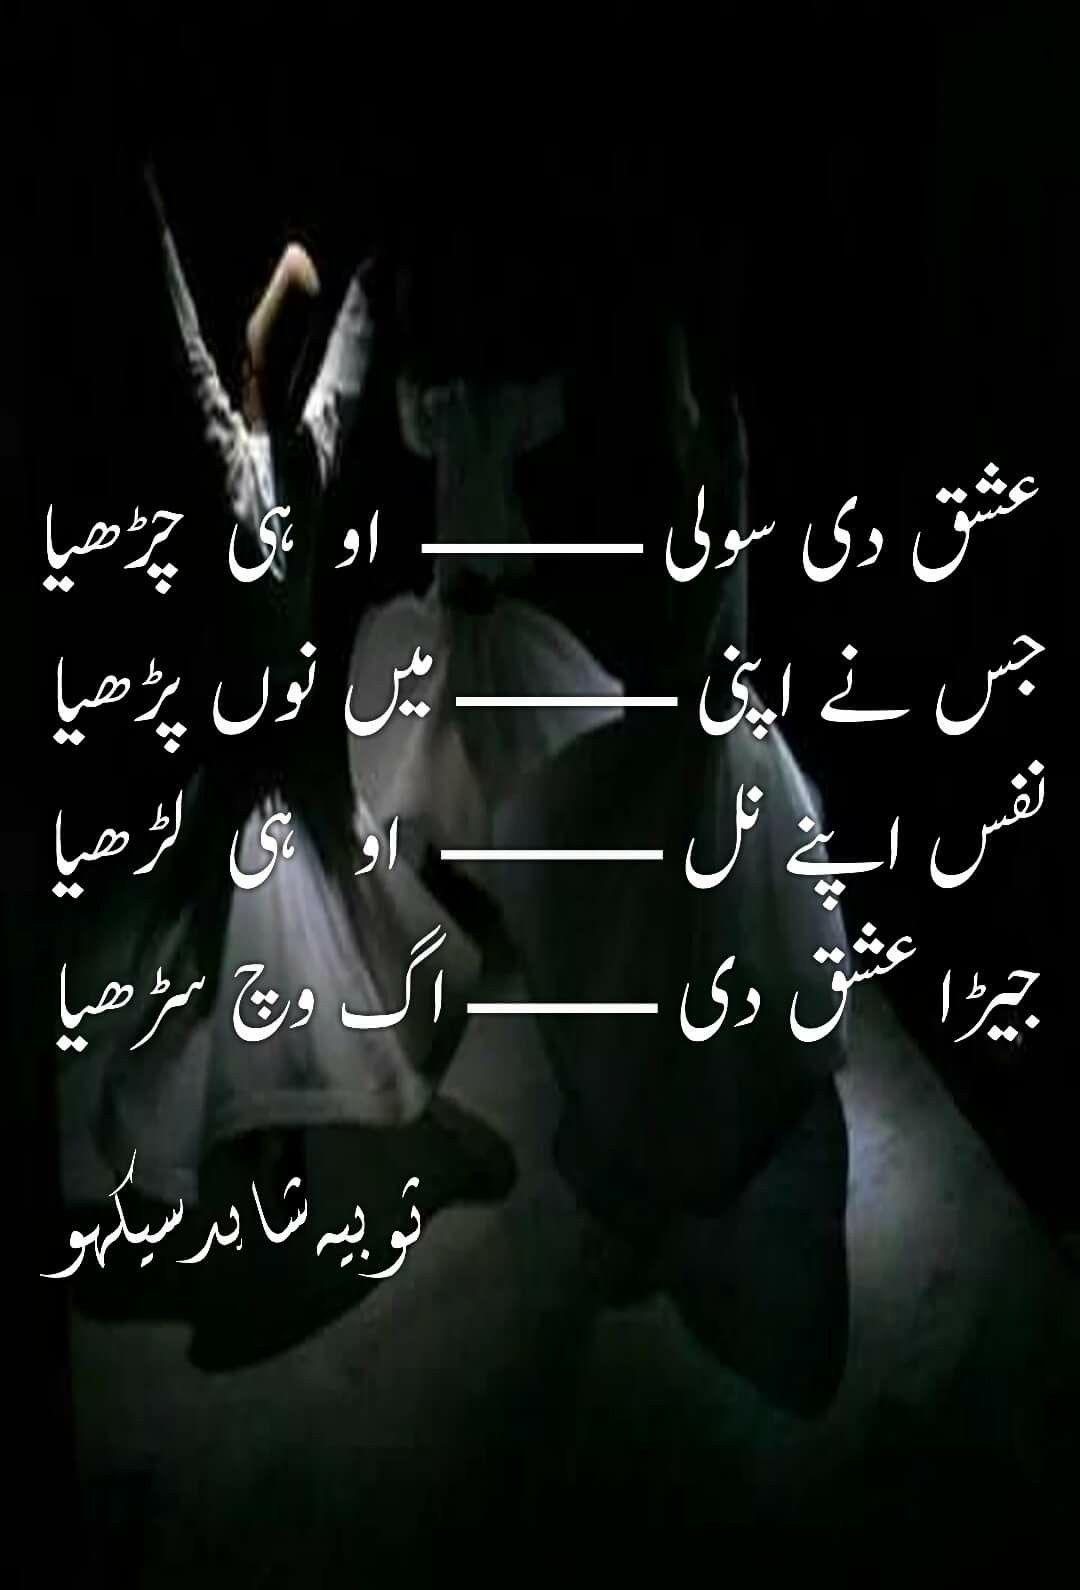 Pin by Shabana on تصوف & Punjabi   Deep words, Poetry ...